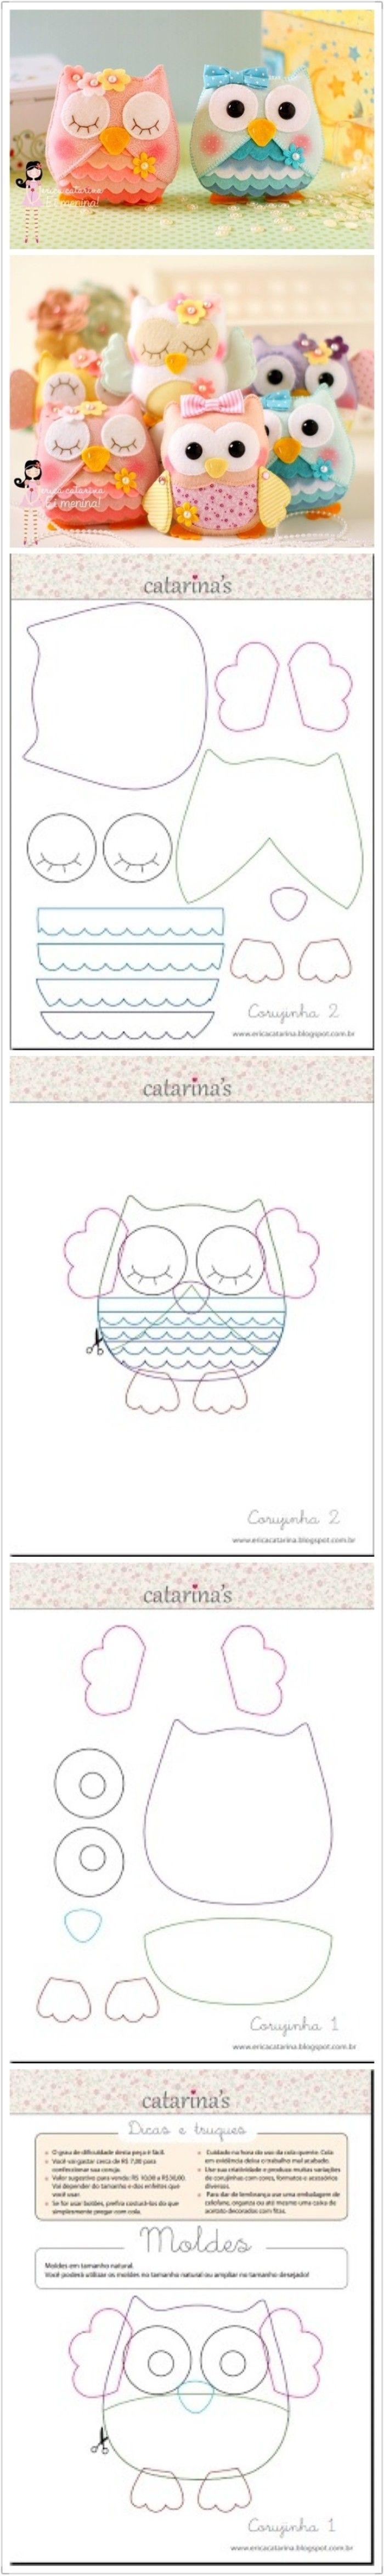 1087 best felt images on pinterest crafts fedoras and felt animals